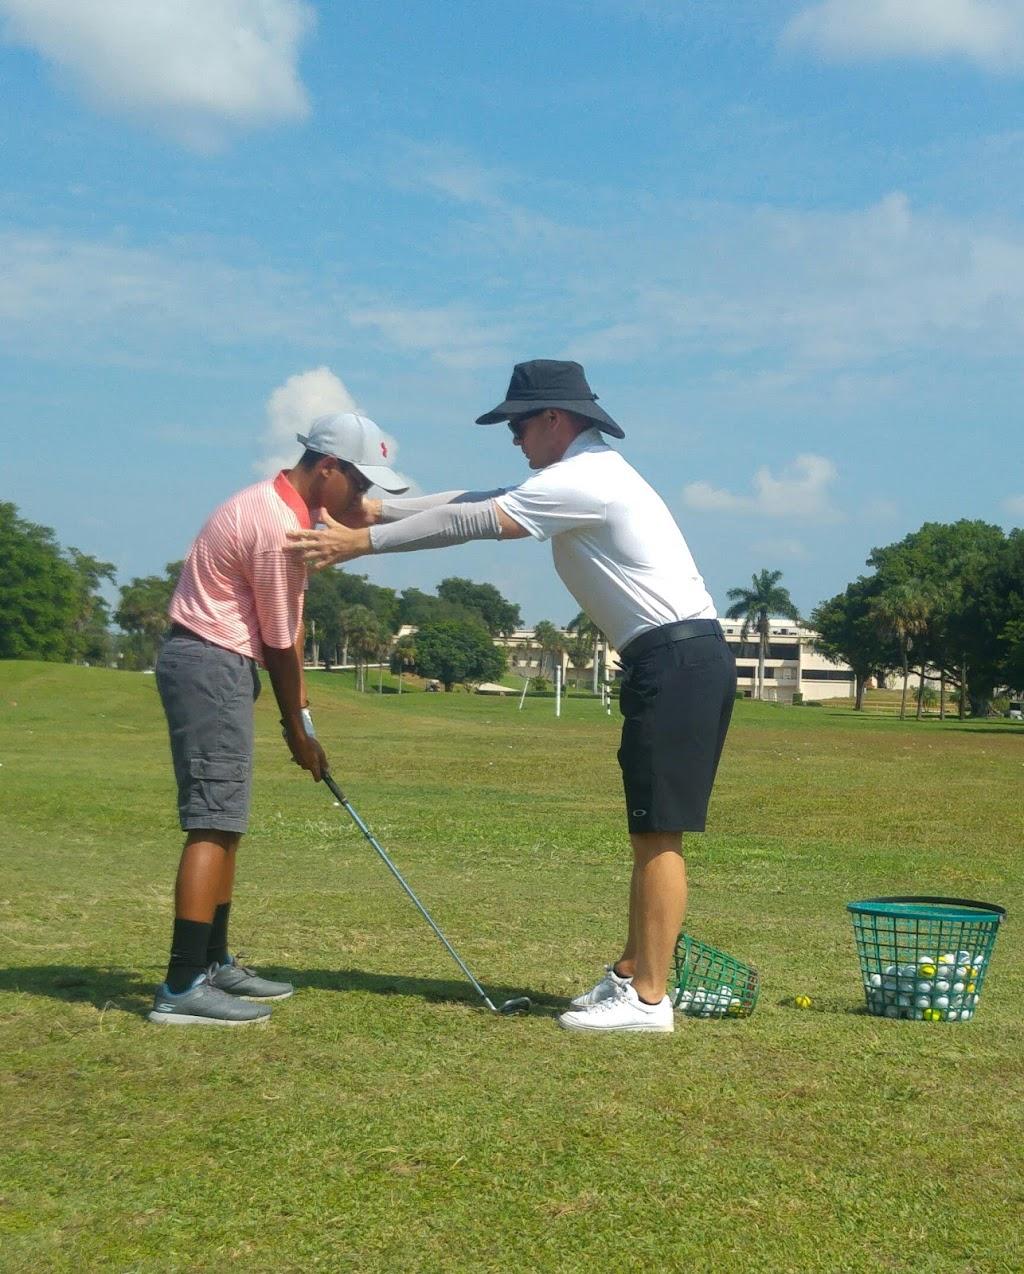 Duncan Smith Golf Instruction - school  | Photo 4 of 10 | Address: 7050 W Broward Blvd, Plantation, FL 33317, USA | Phone: (954) 854-2020